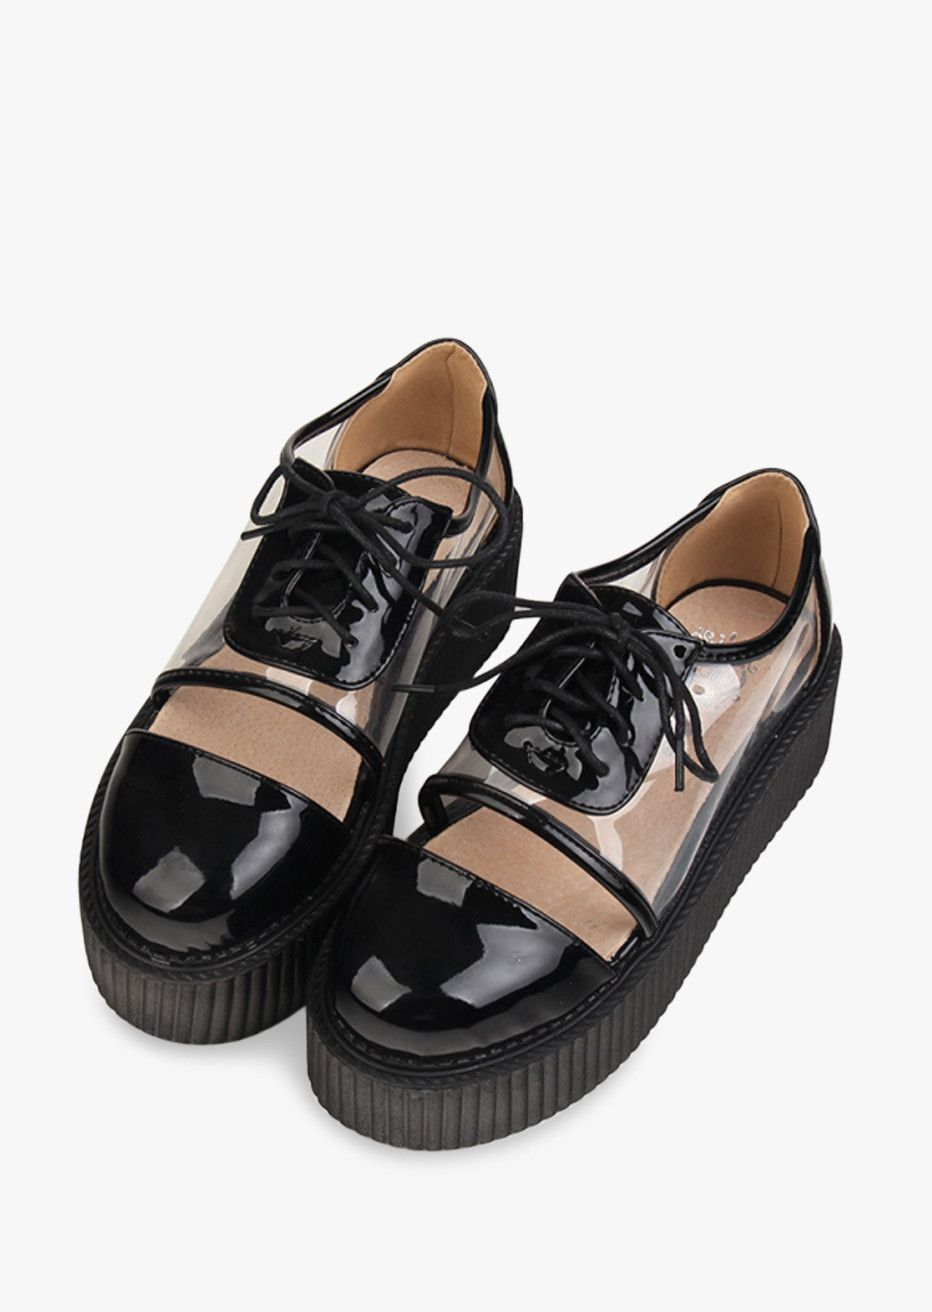 27502205fac Sapato feminino 2015 women platform shoes fashion punk style t k shoes lace  up transparent shoes creepers women harajuku shoes